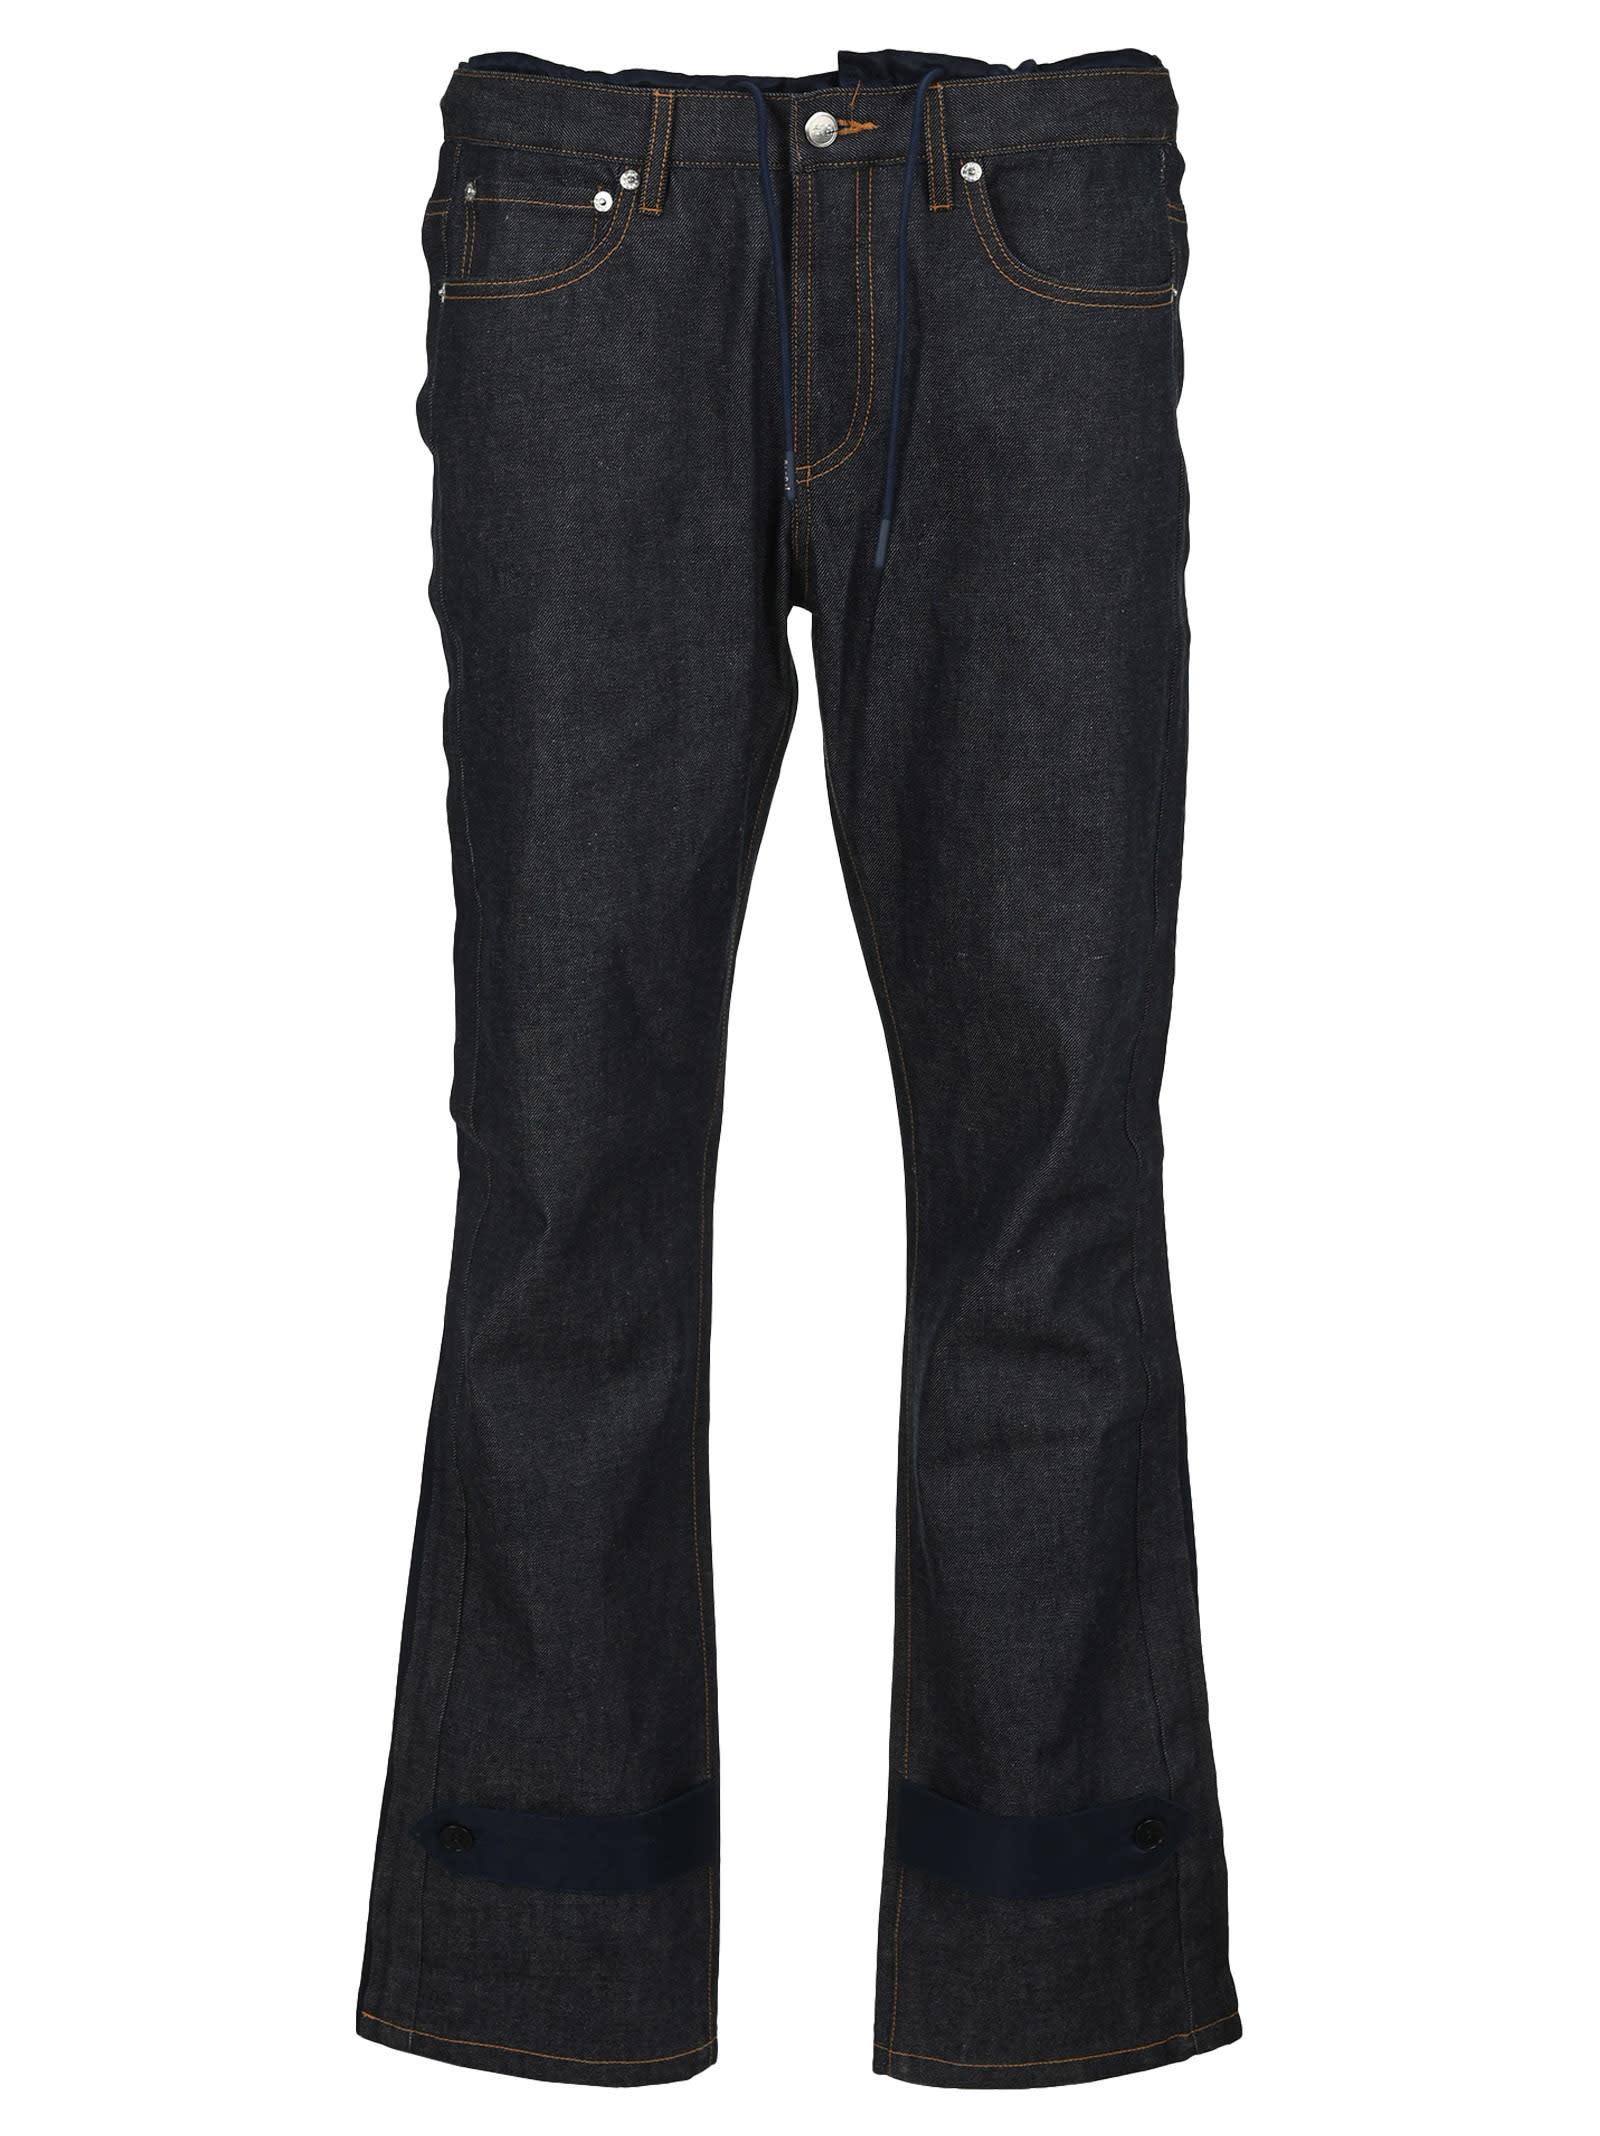 A.p.c. X Sacai Haru Trousers